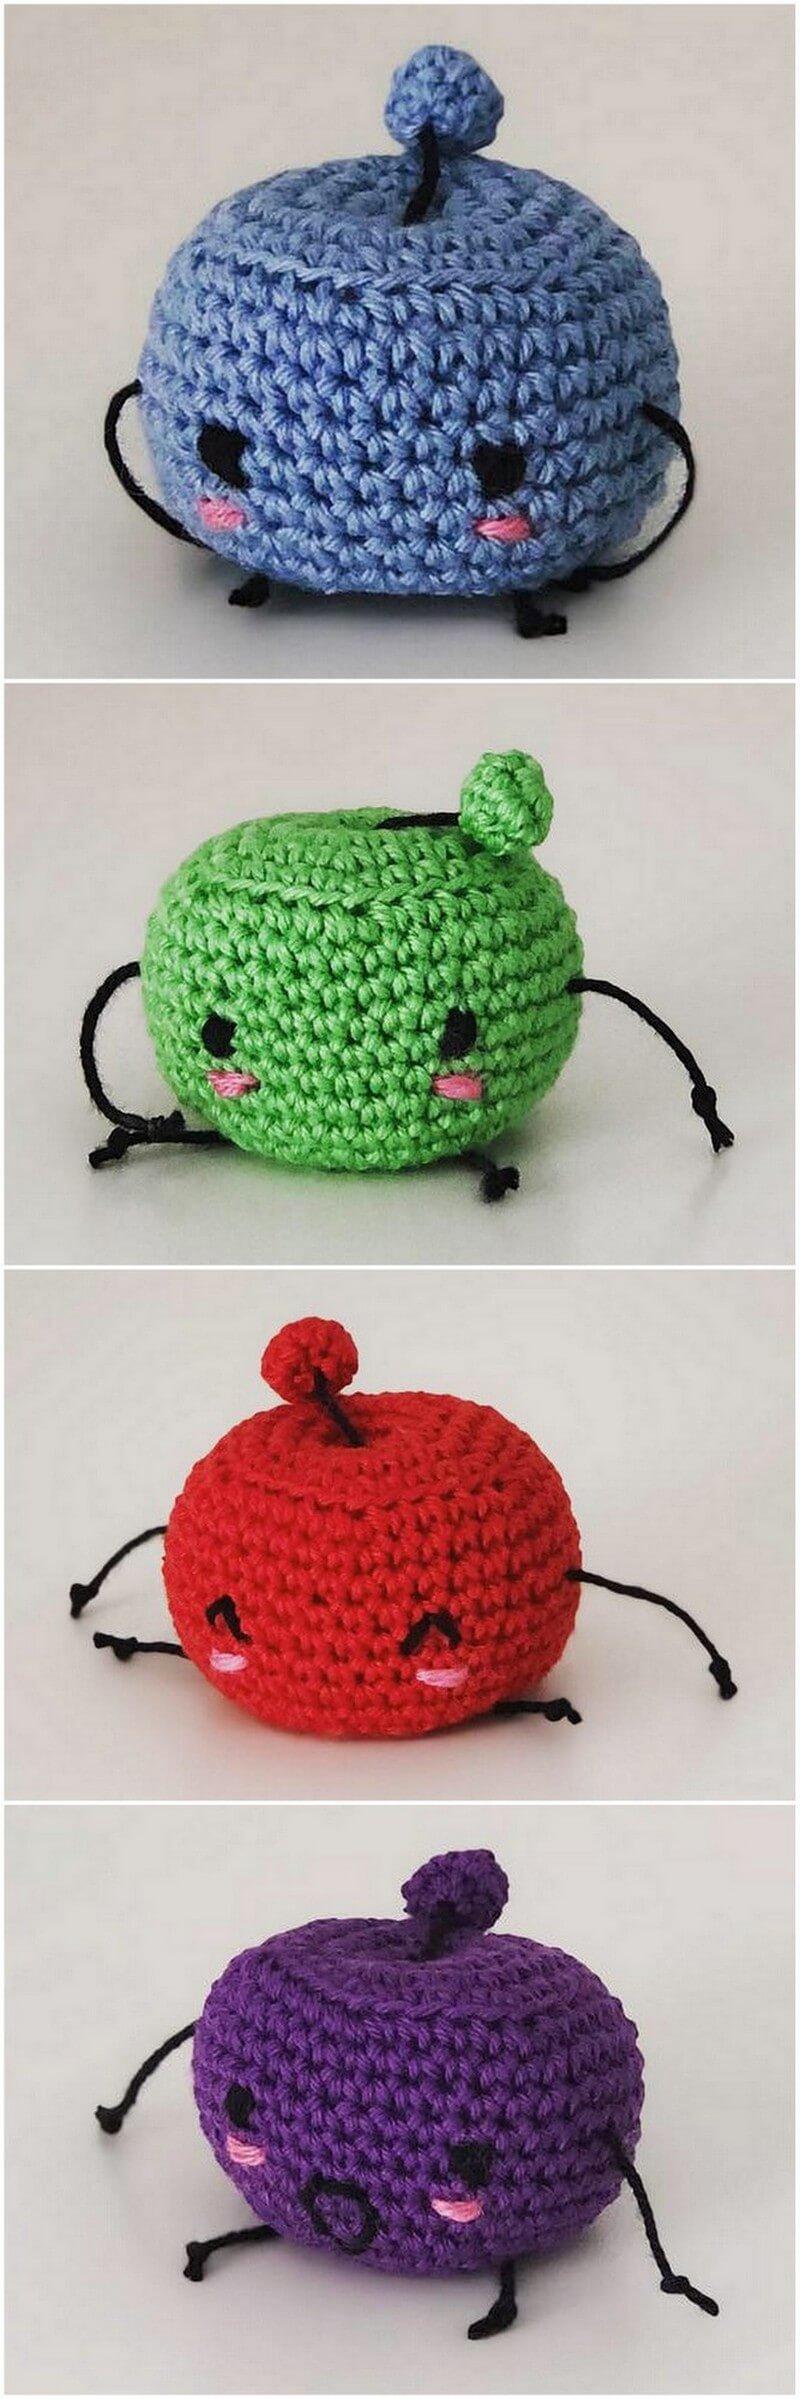 Free Crochet Amigurumi Pattern (25)